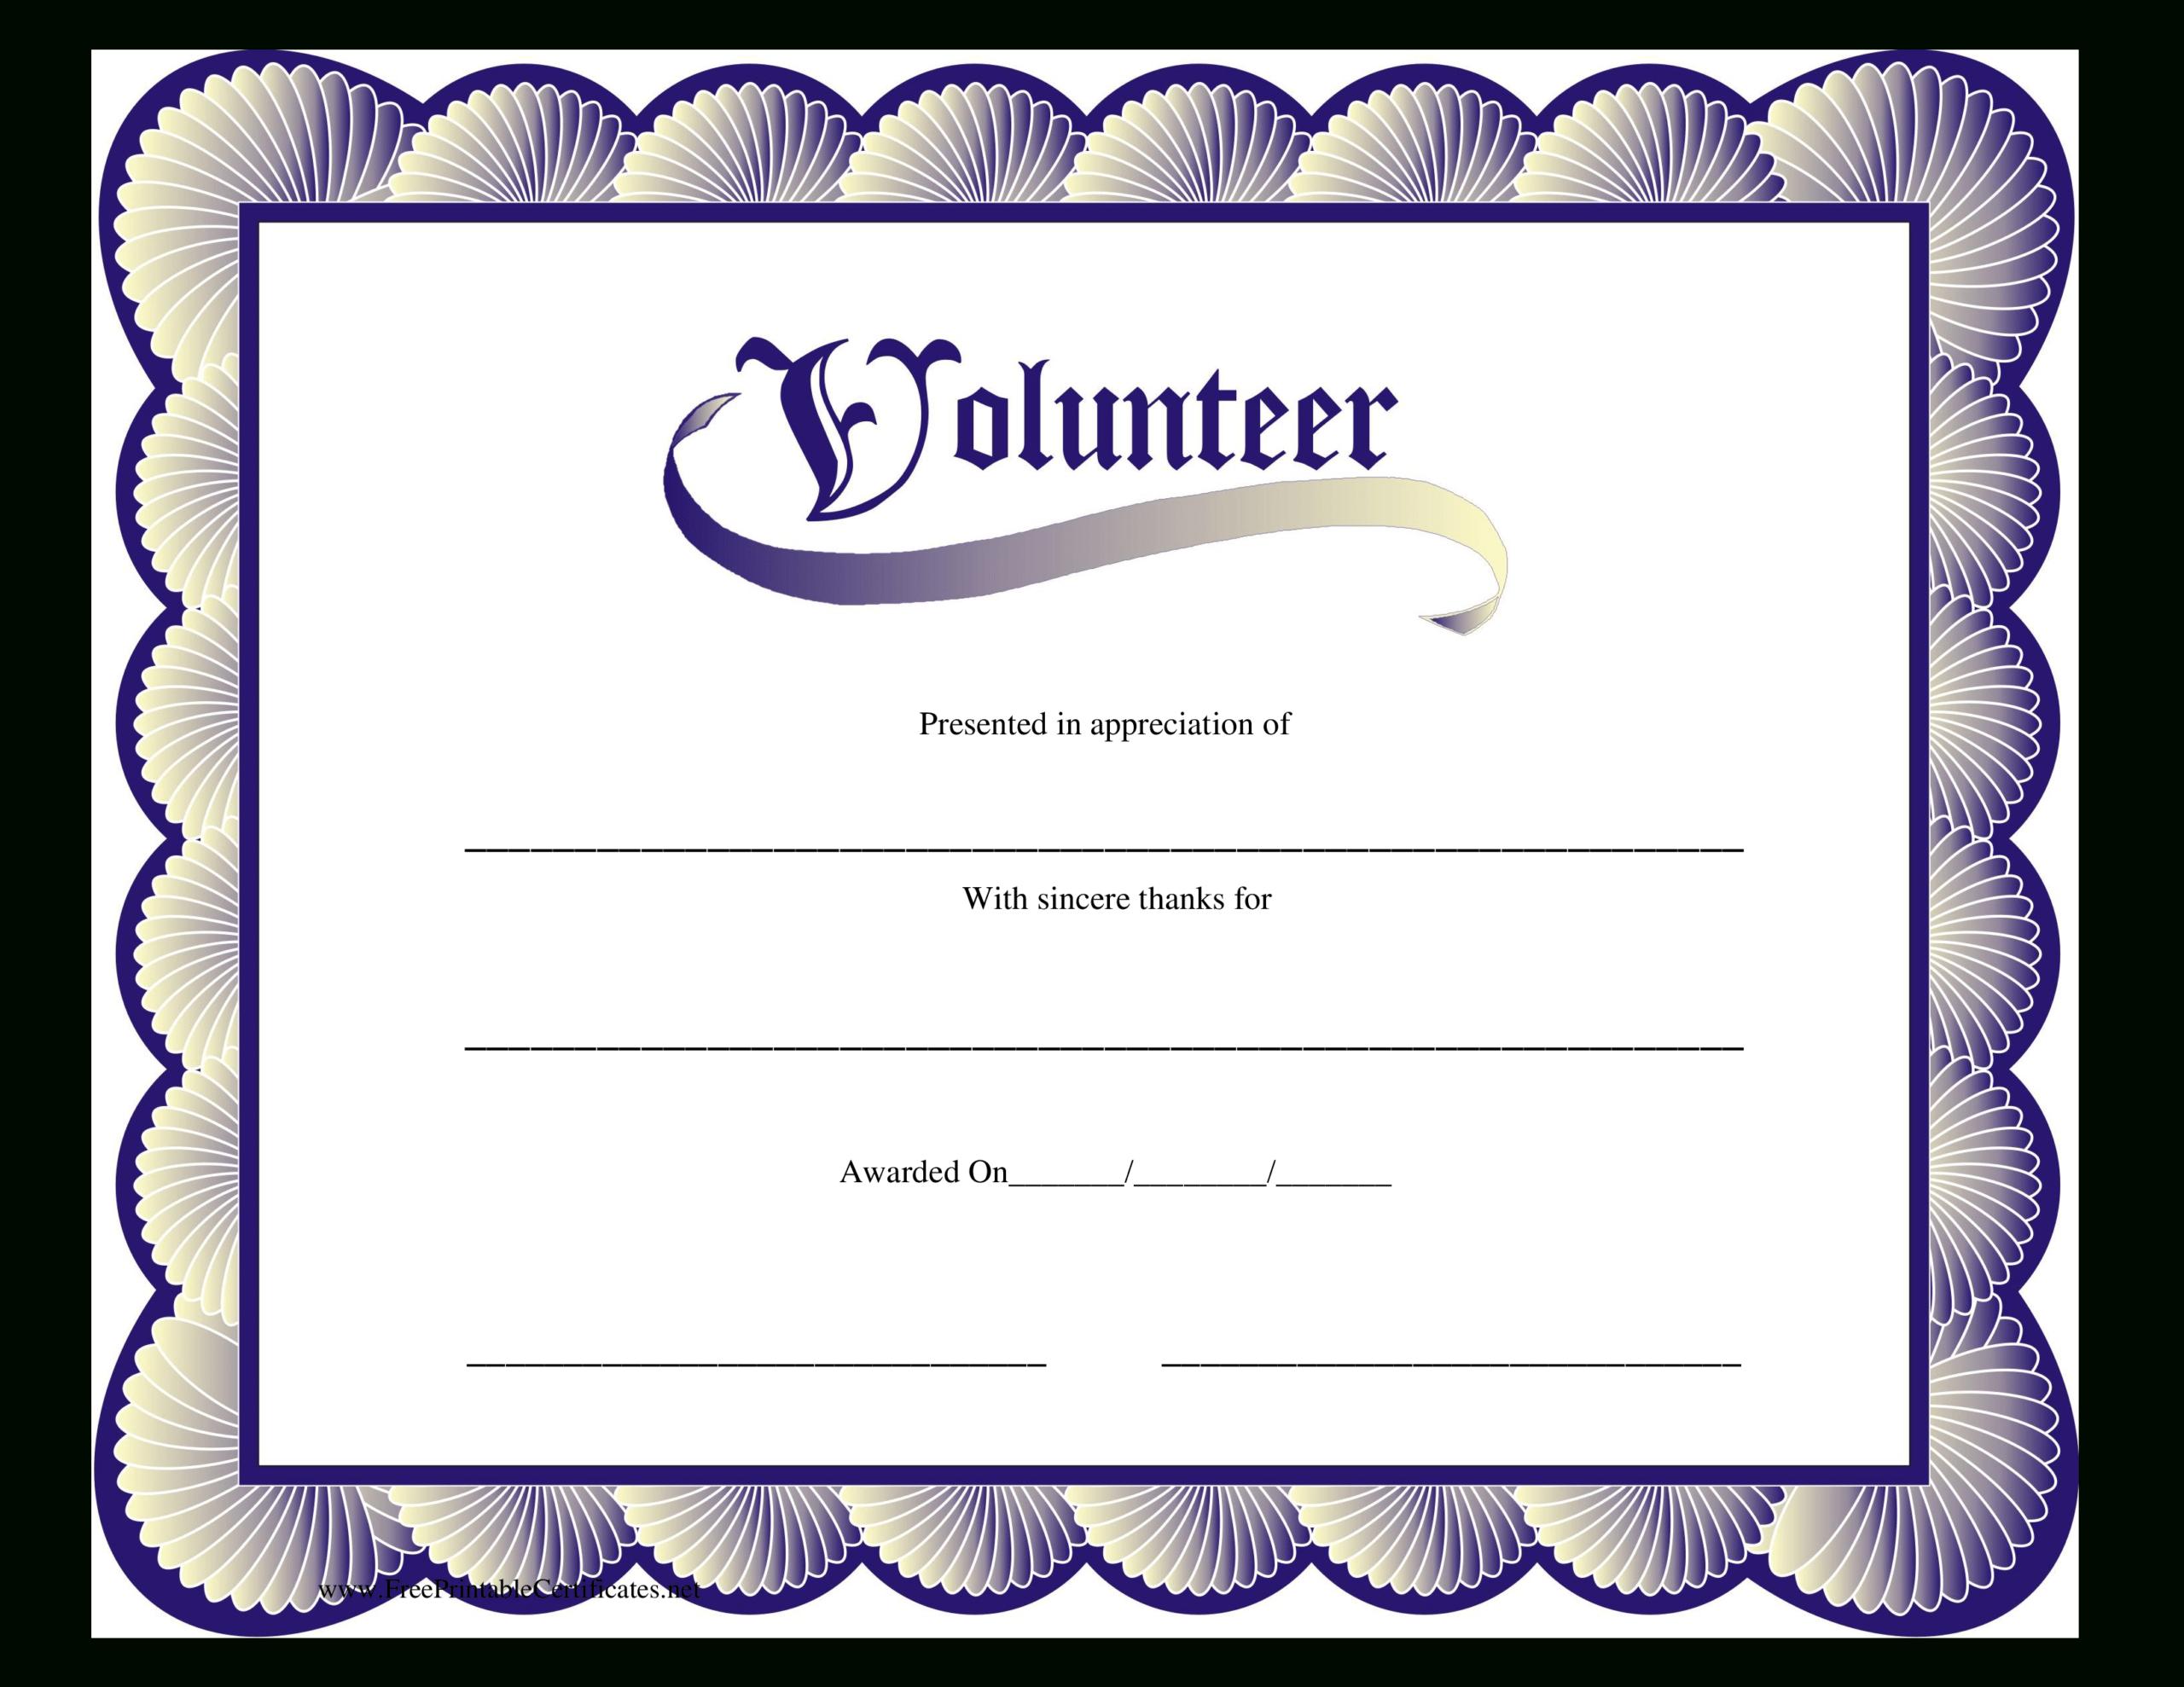 Volunteer Certificate | Templates At Allbusinesstemplates pertaining to Volunteer Certificate Template